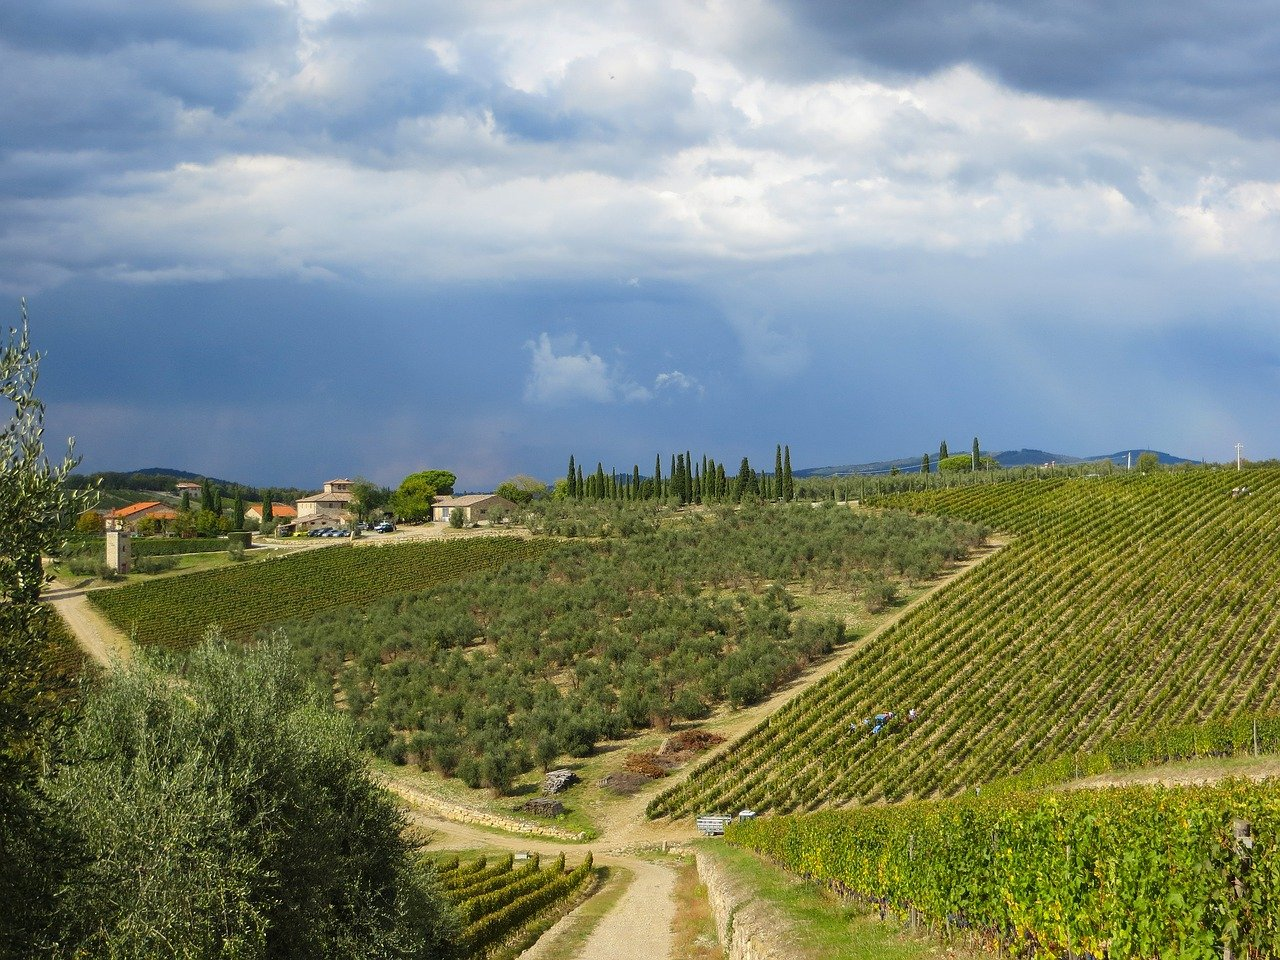 Chianti, Incrociata, Agriturismo Incrociata, Tuscan Agriturismo, Farmhouse suites, Holiday apartments Tuscany, Tuscany accommodation, Tuscan holiday home, Casa vacanza